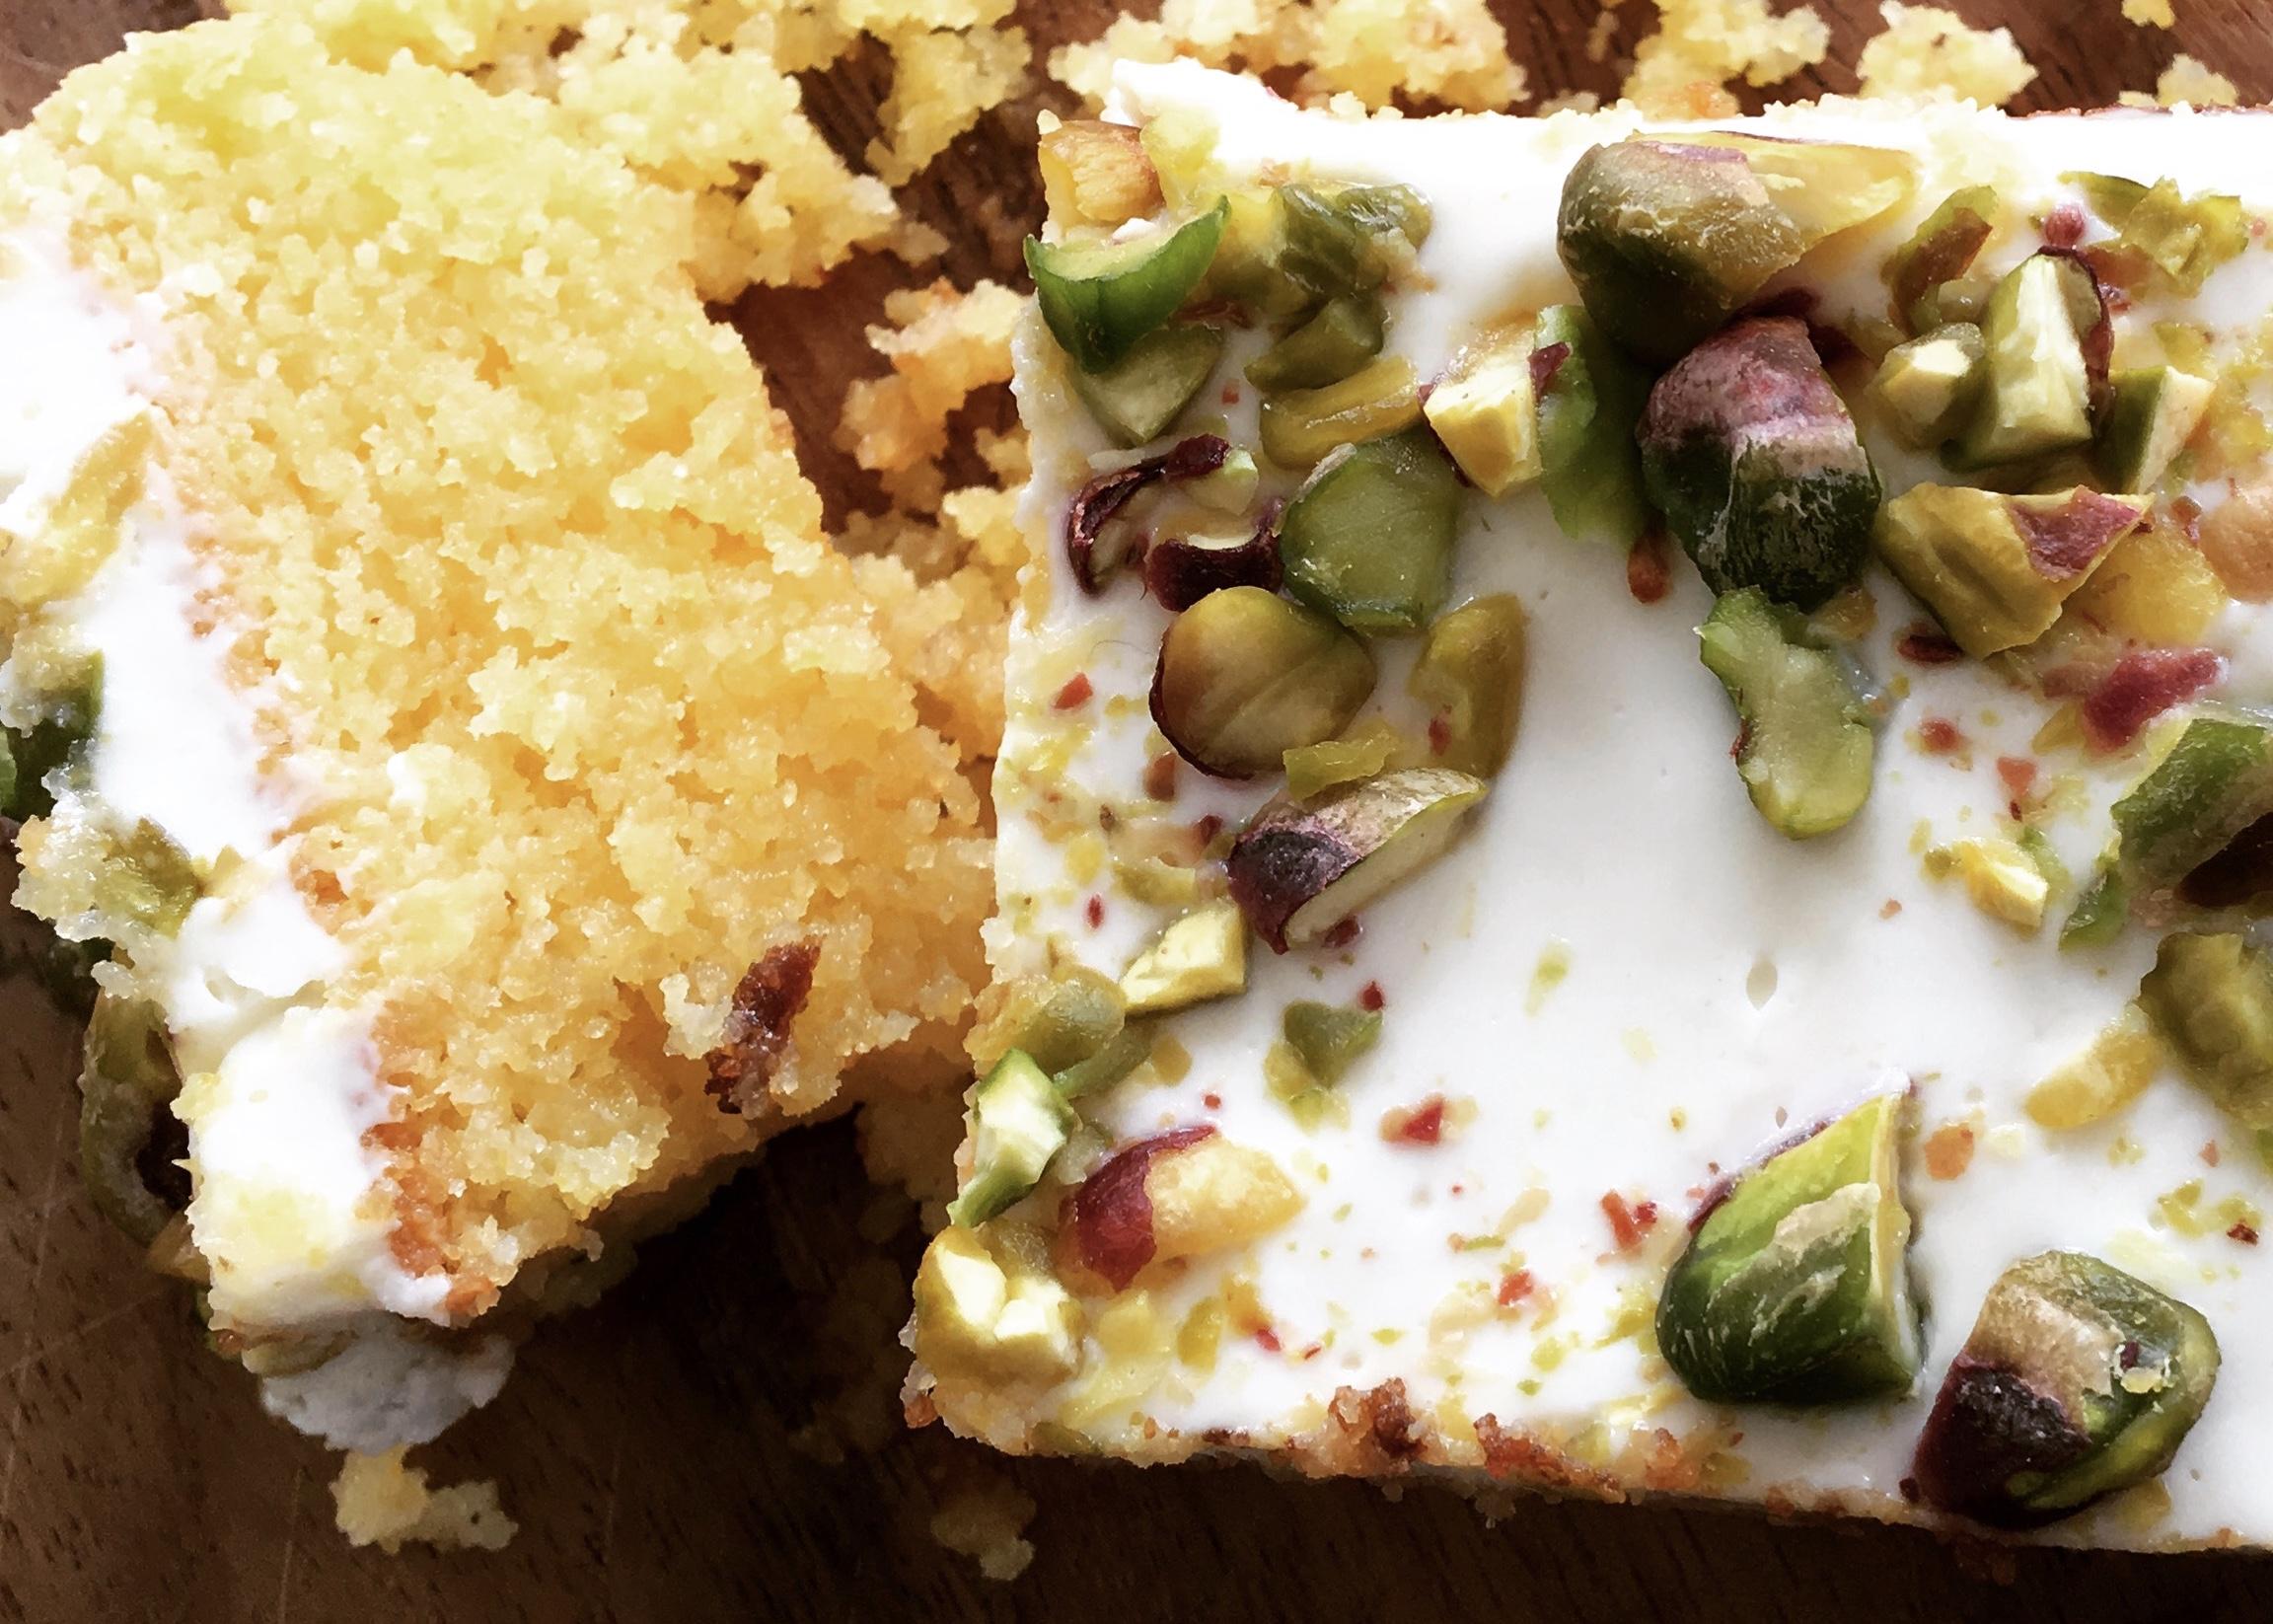 elderflower-yogurt-pistachio-polenta-cake.jpg